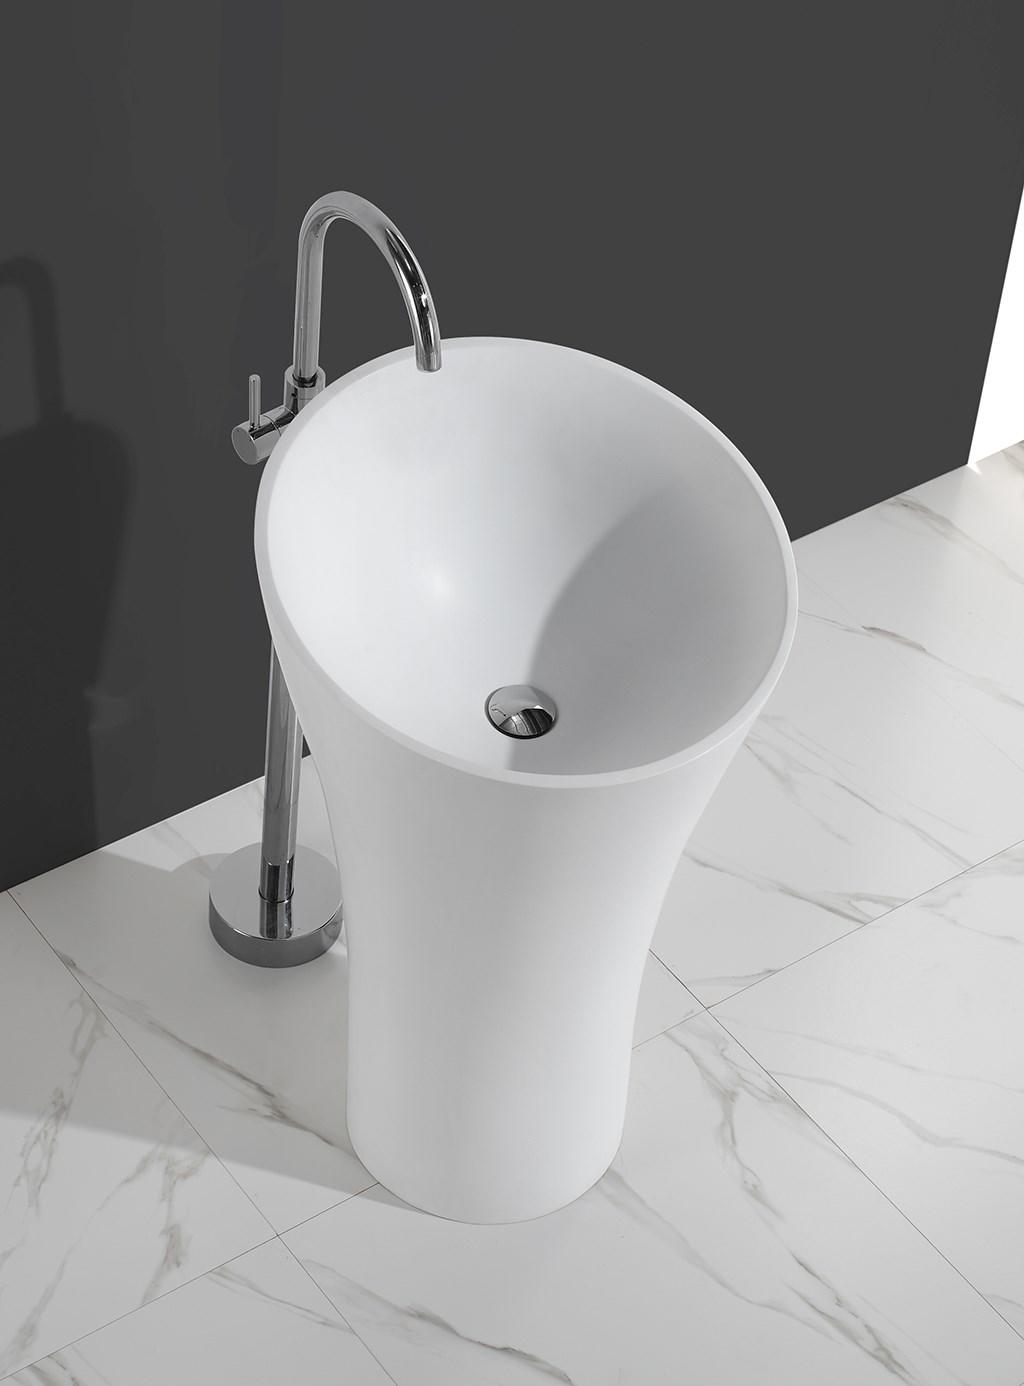 KingKonree pan shape free standing wash basin factory price for hotel-1